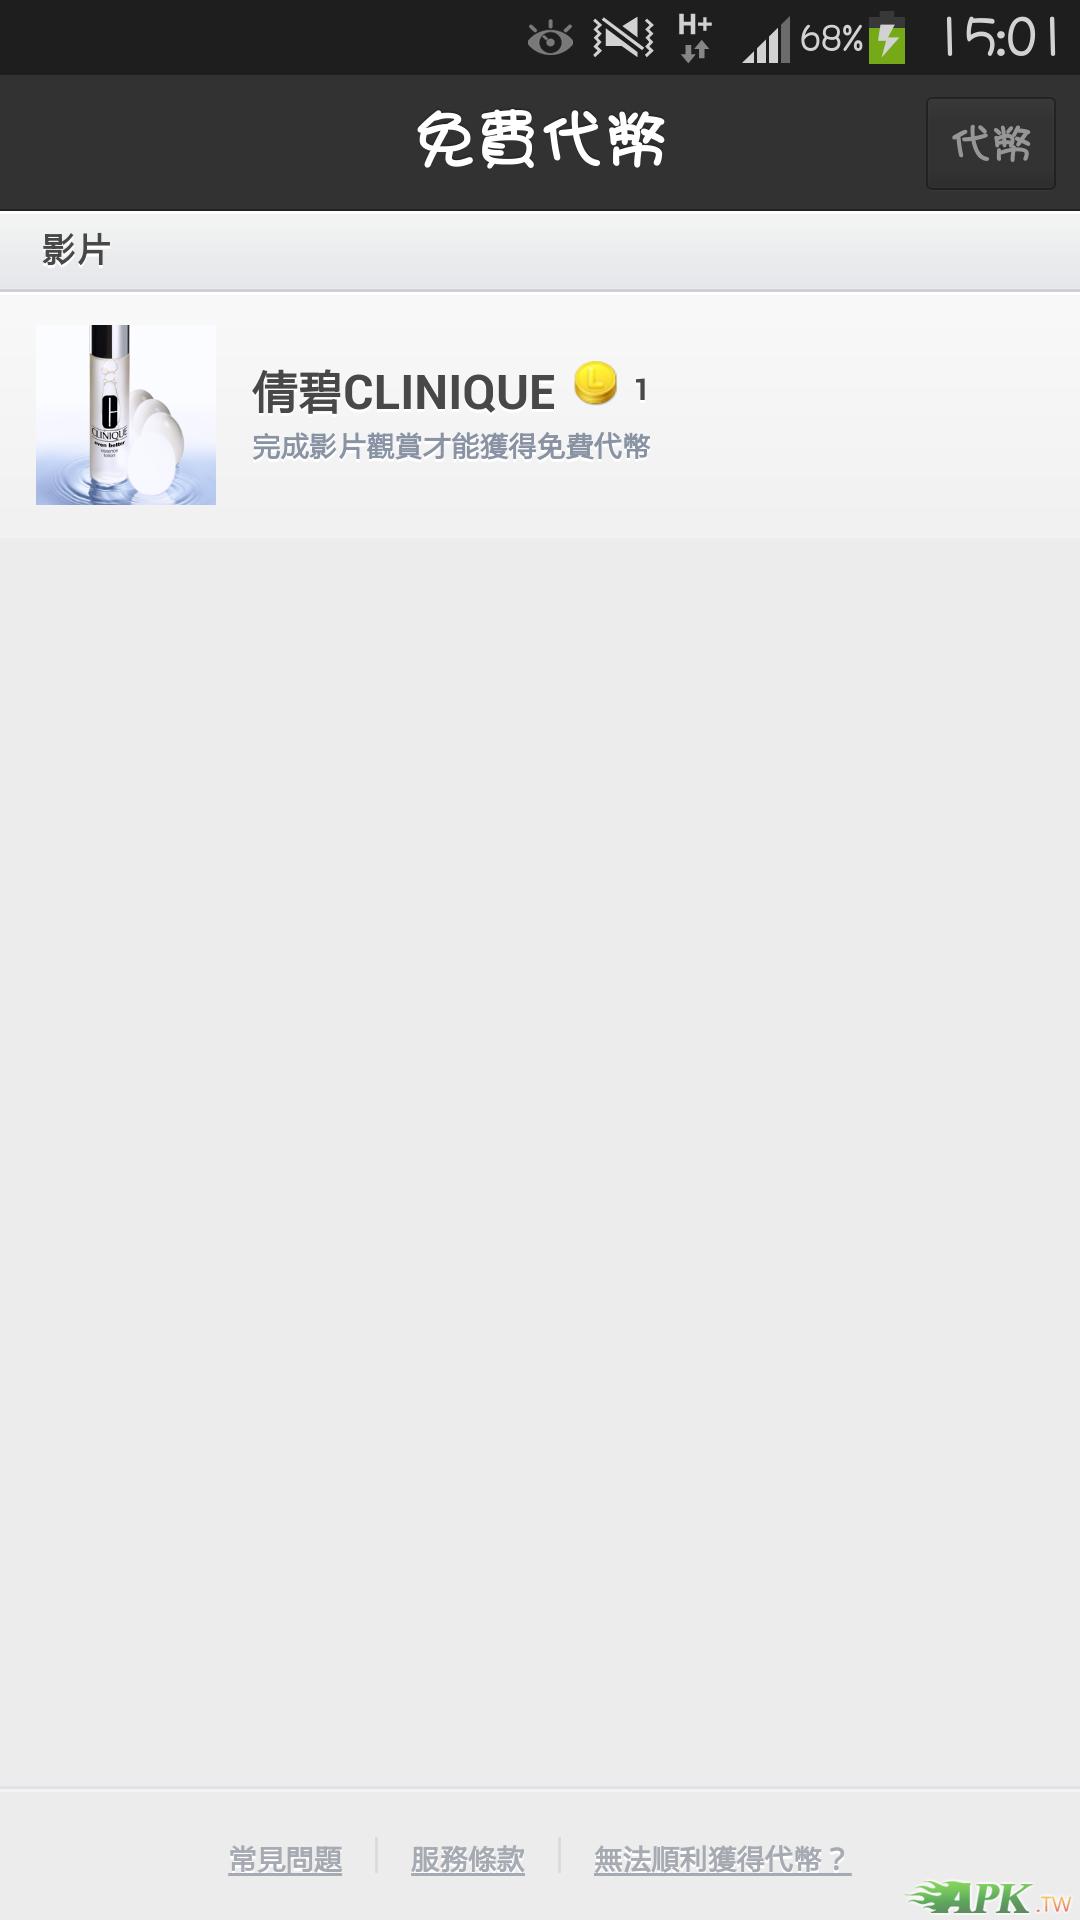 Screenshot_2014-03-20-15-01-16.png